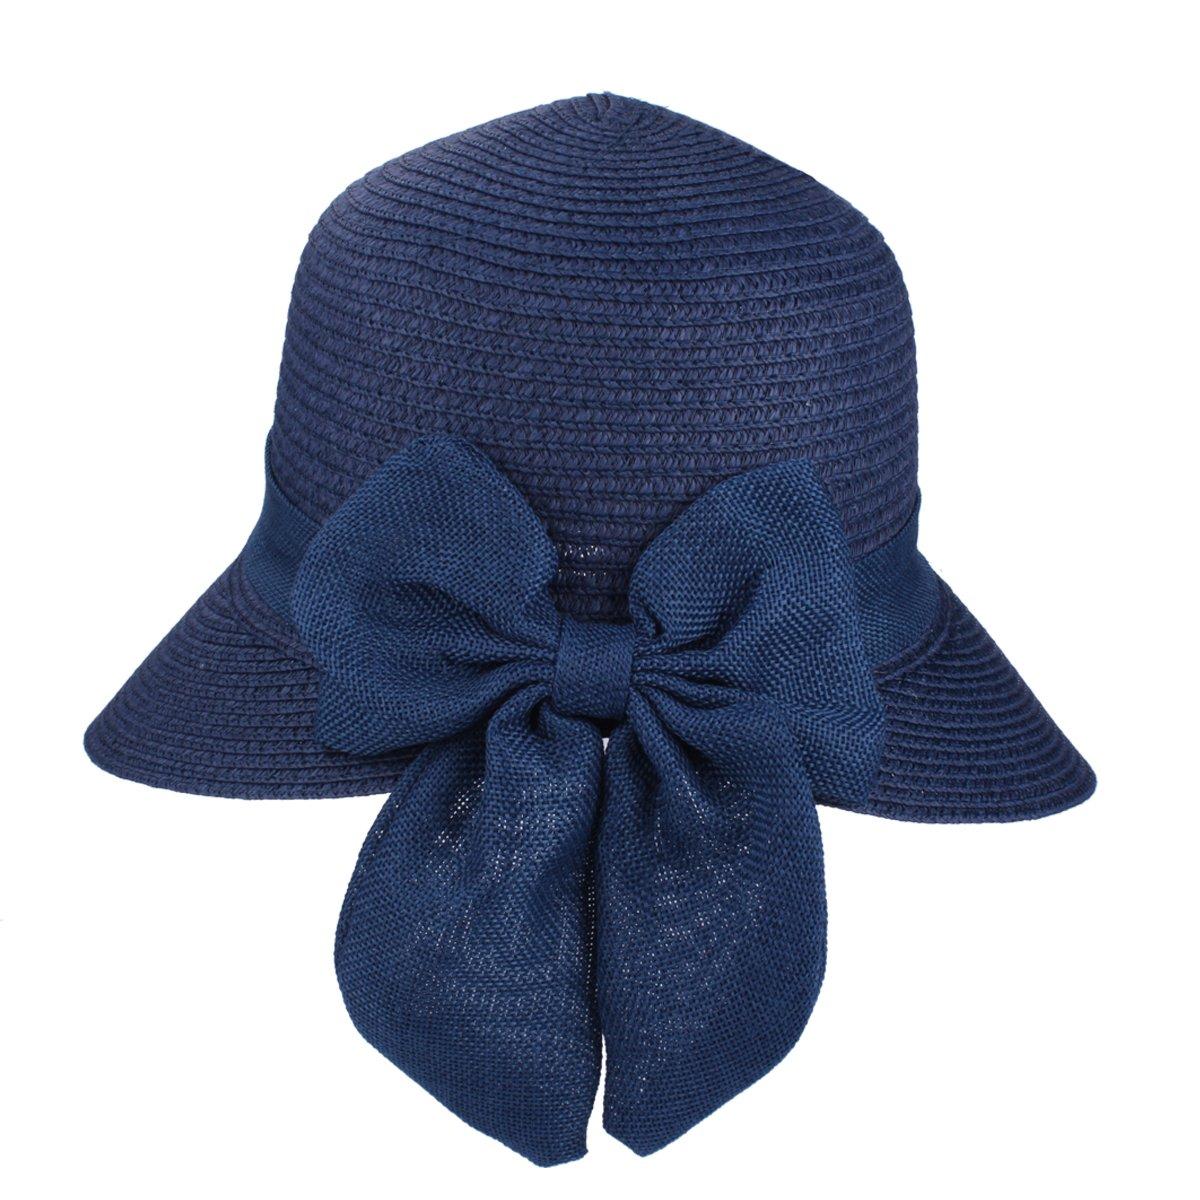 Bowknot Casual Sombrero de Paja para Mujer Verano Sun Beach Sombrero de Paja  UPF 50+ 4e8b6ac399eb